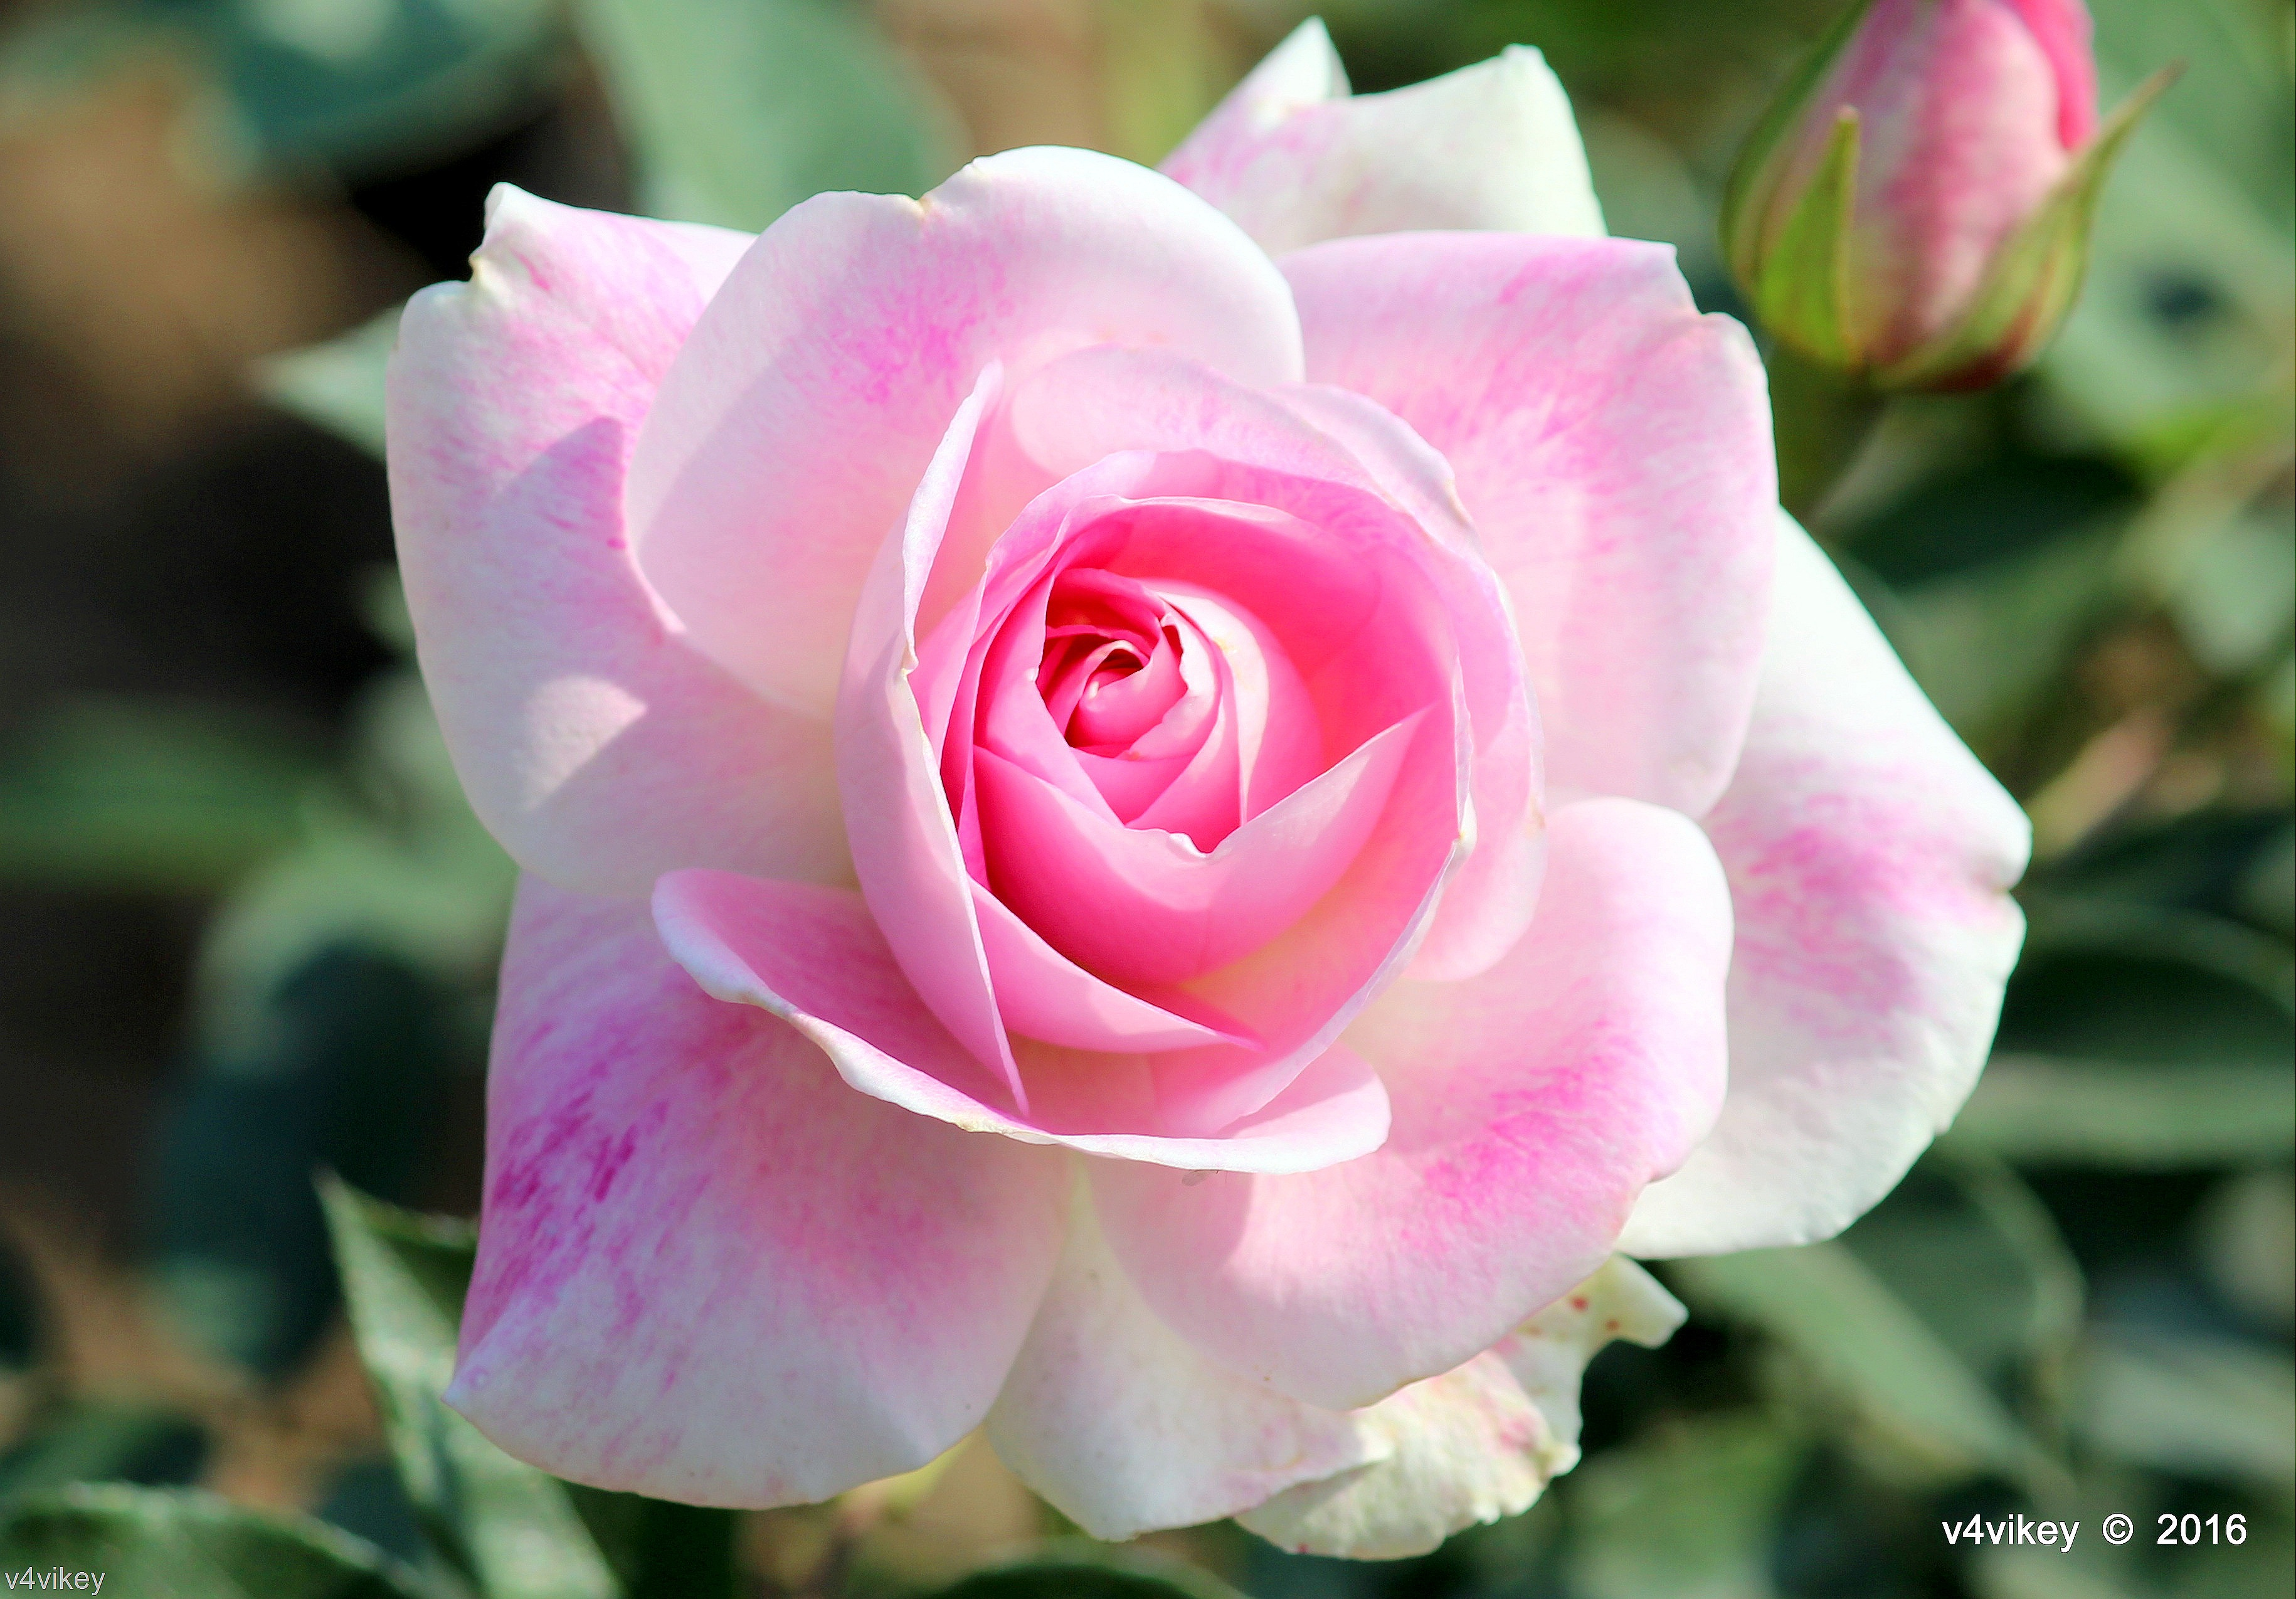 Free photo beautiful rose red pedals nature free download beautiful rose izmirmasajfo